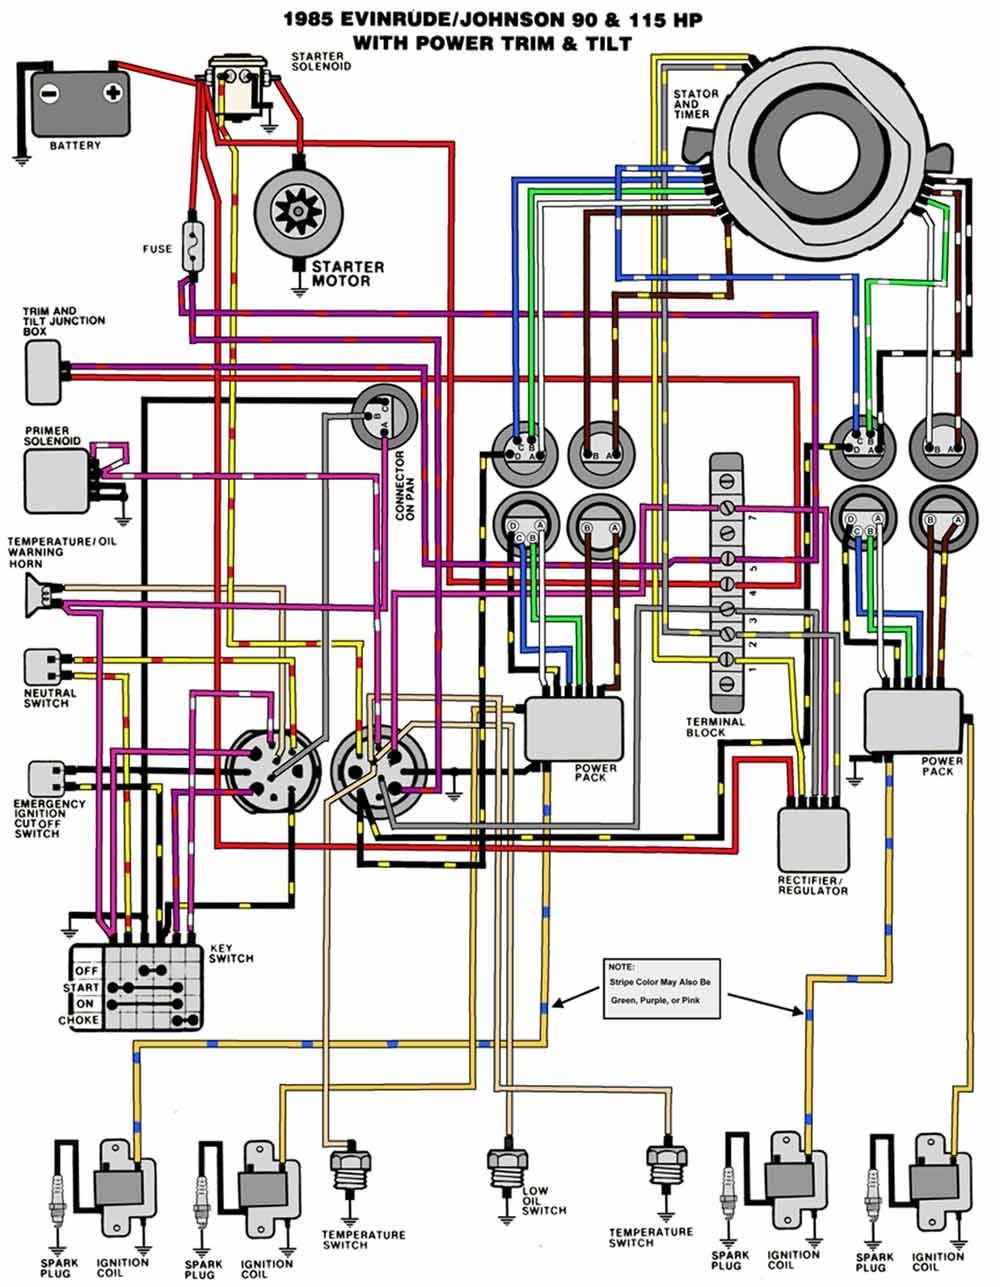 hight resolution of power tilt and trim wiring diagram wiring diagram paperomc tilt trim wiring diagram wiring diagram paper